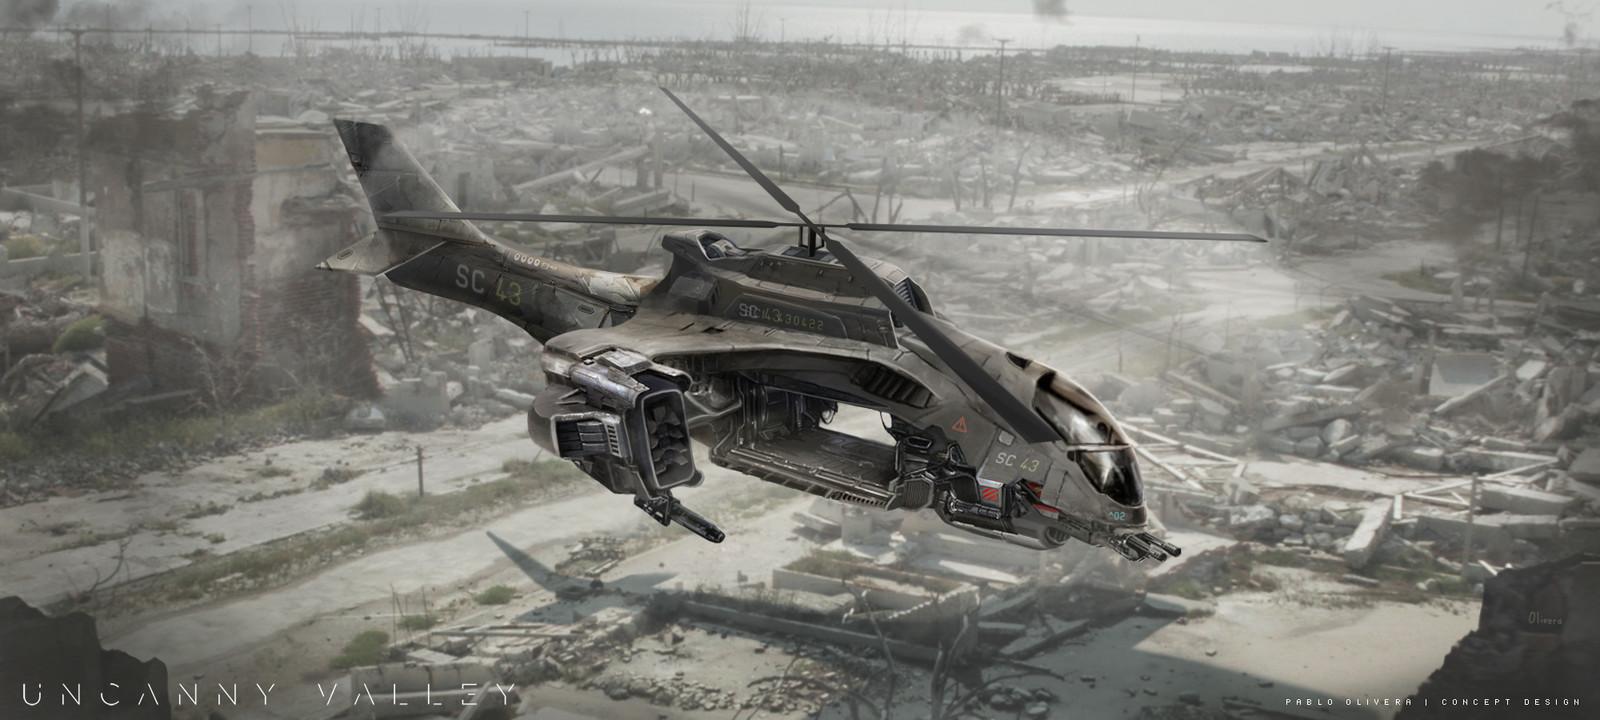 Vehicle design for Uncanny Valley ( Sci-Fi short film 2015)